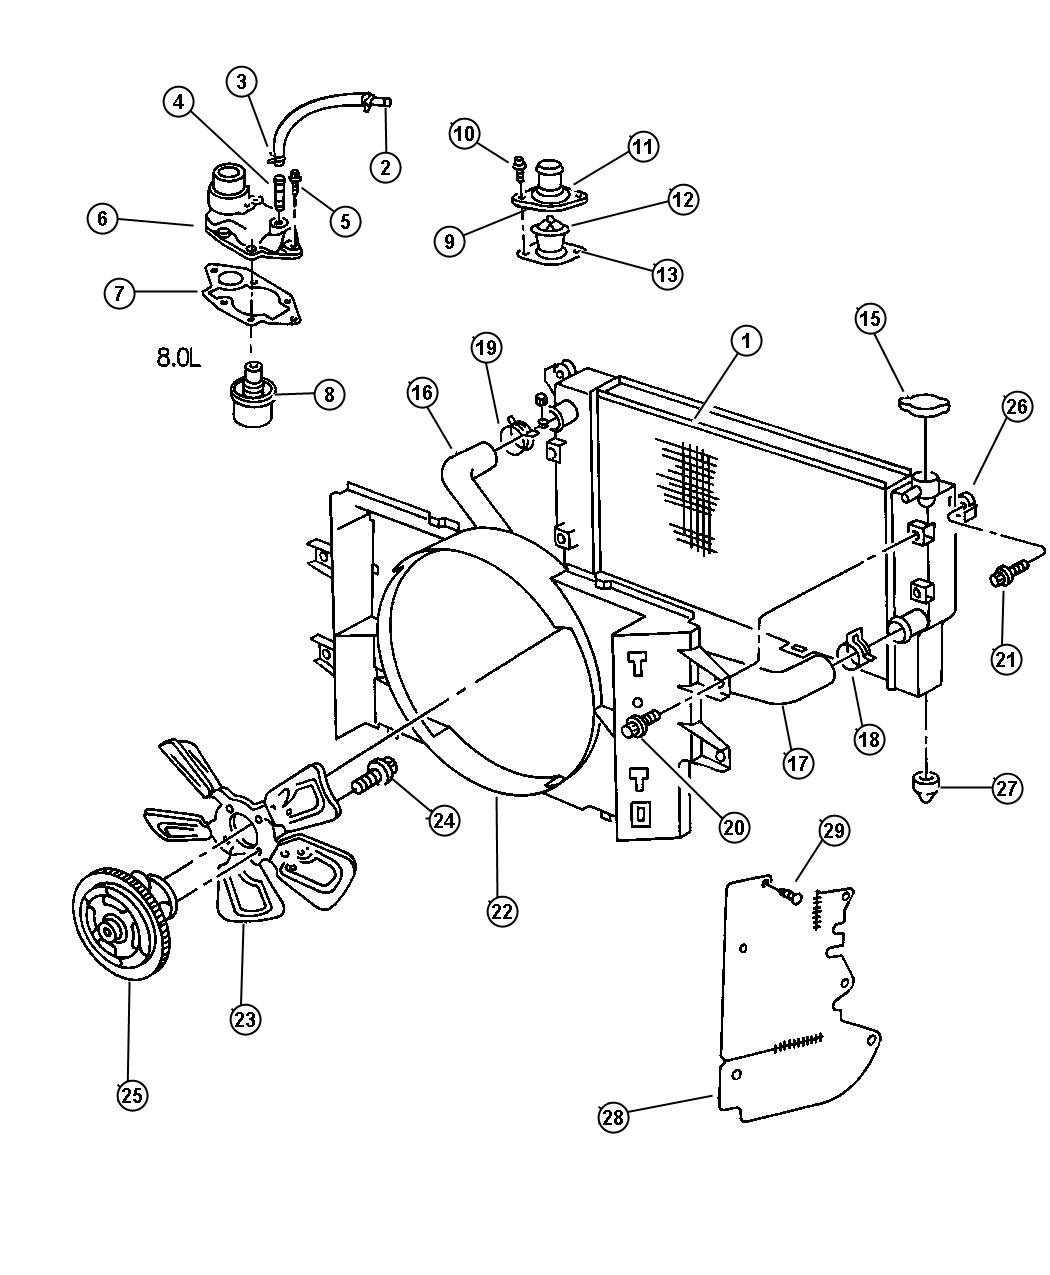 1997 Dodge Ram 1500 Engine Diagram - Fuse Box Chrysler Sebring 2010 -  hyundaiii.yenpancane.jeanjaures37.frWiring Diagram Resource